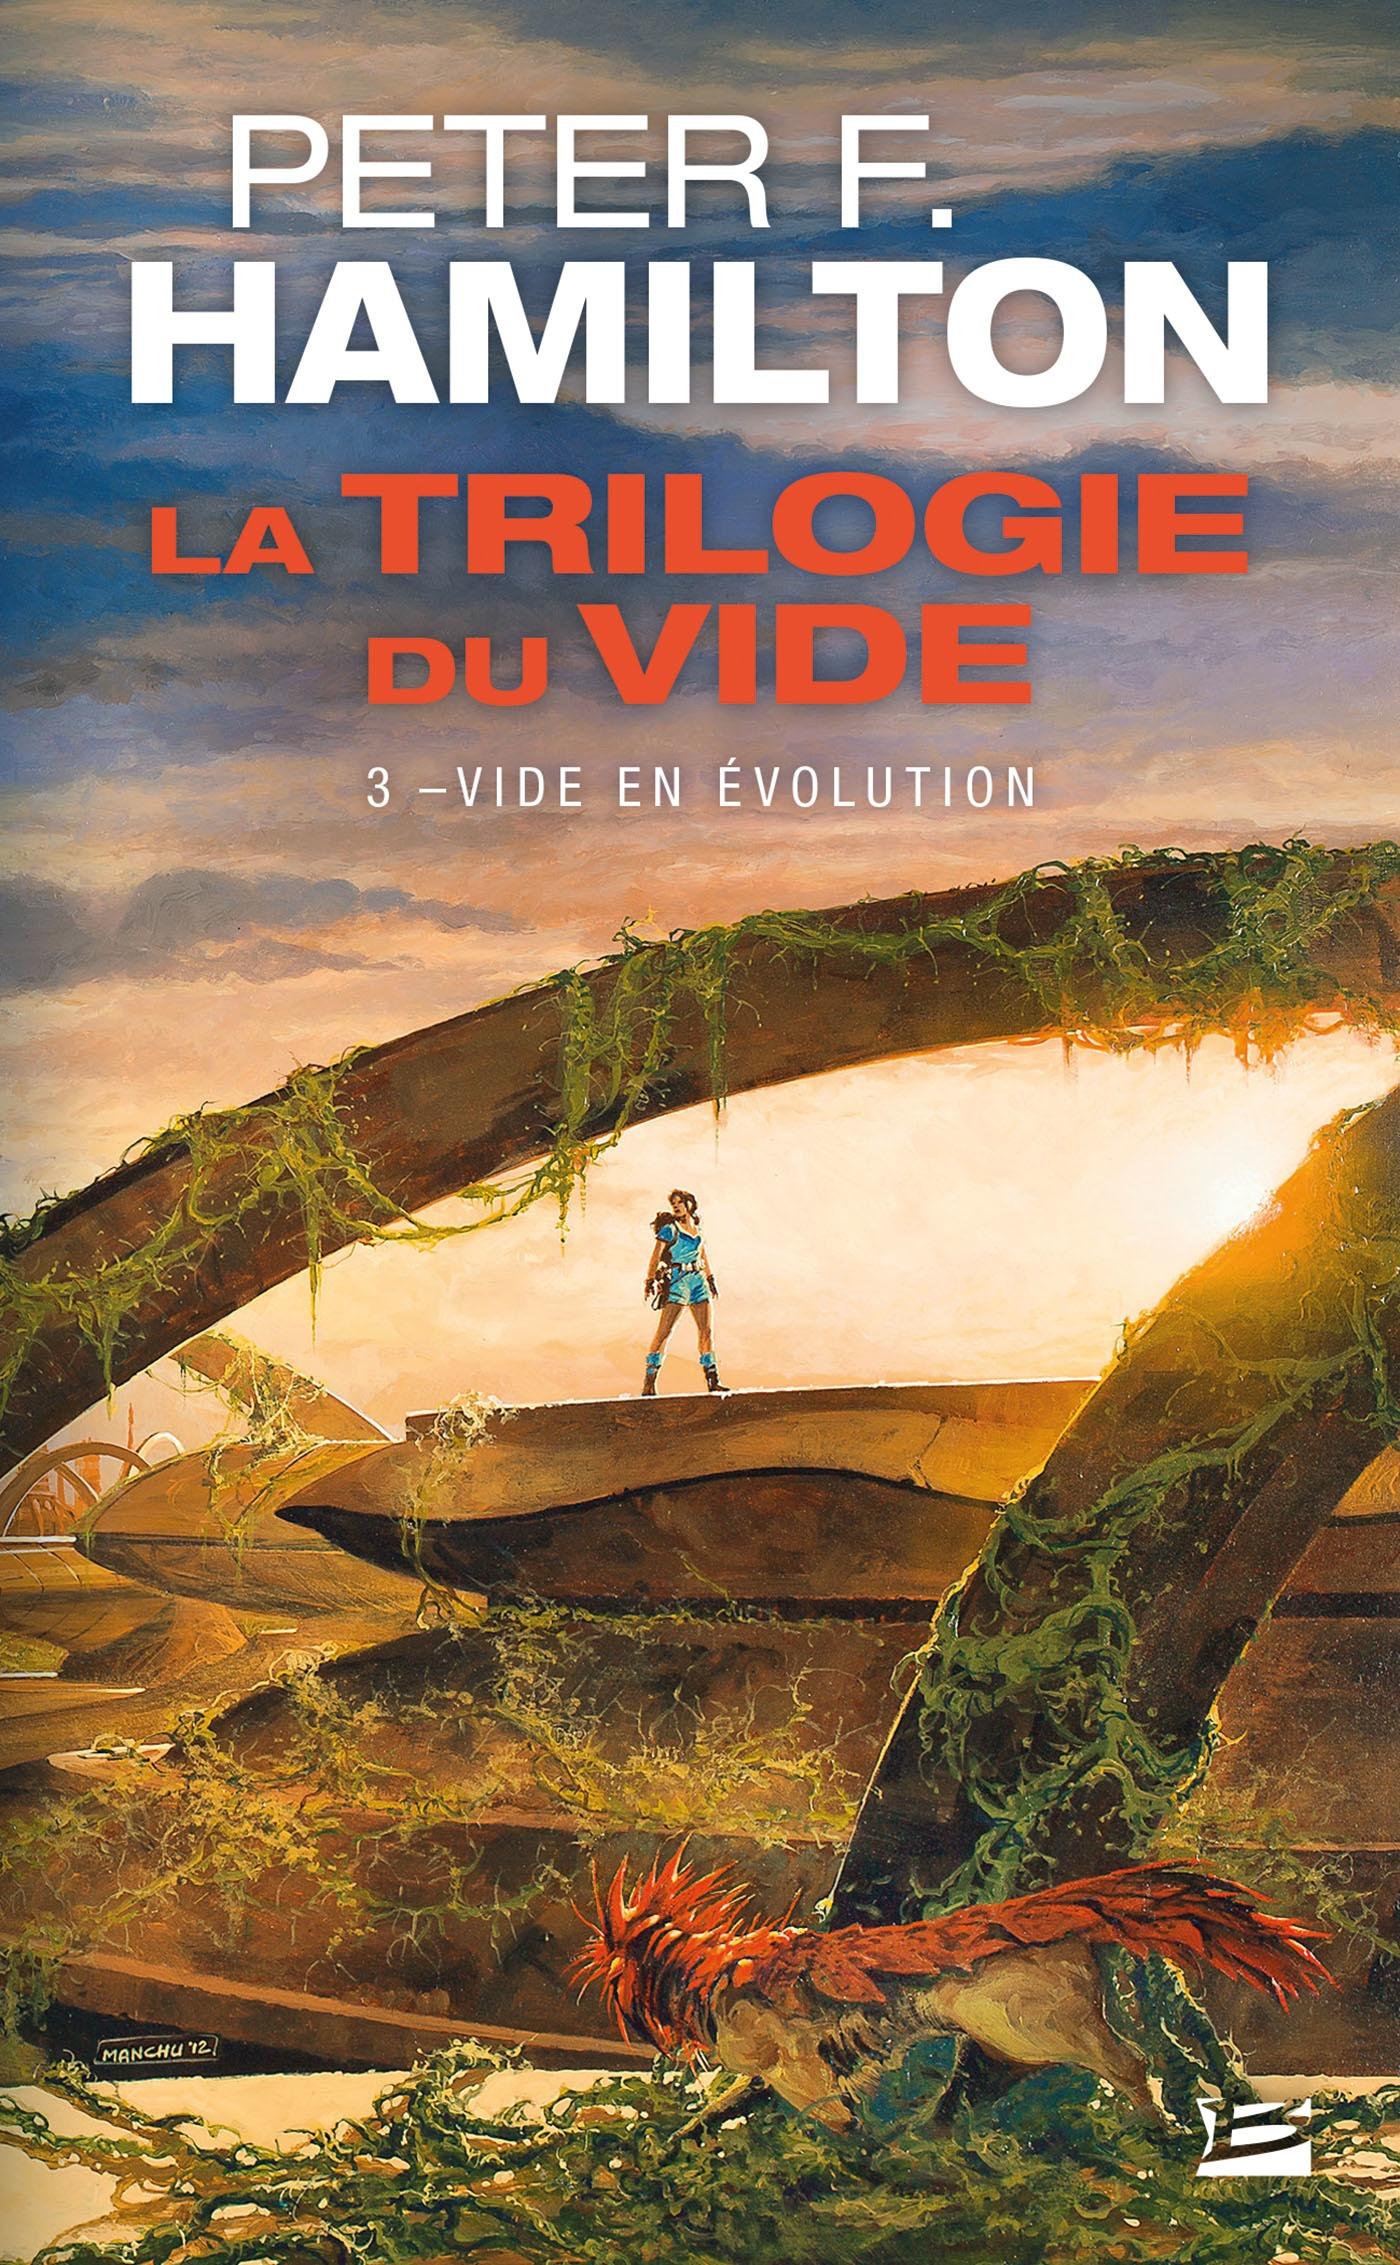 Vide en évolution, LA TRILOGIE DU VIDE, T3